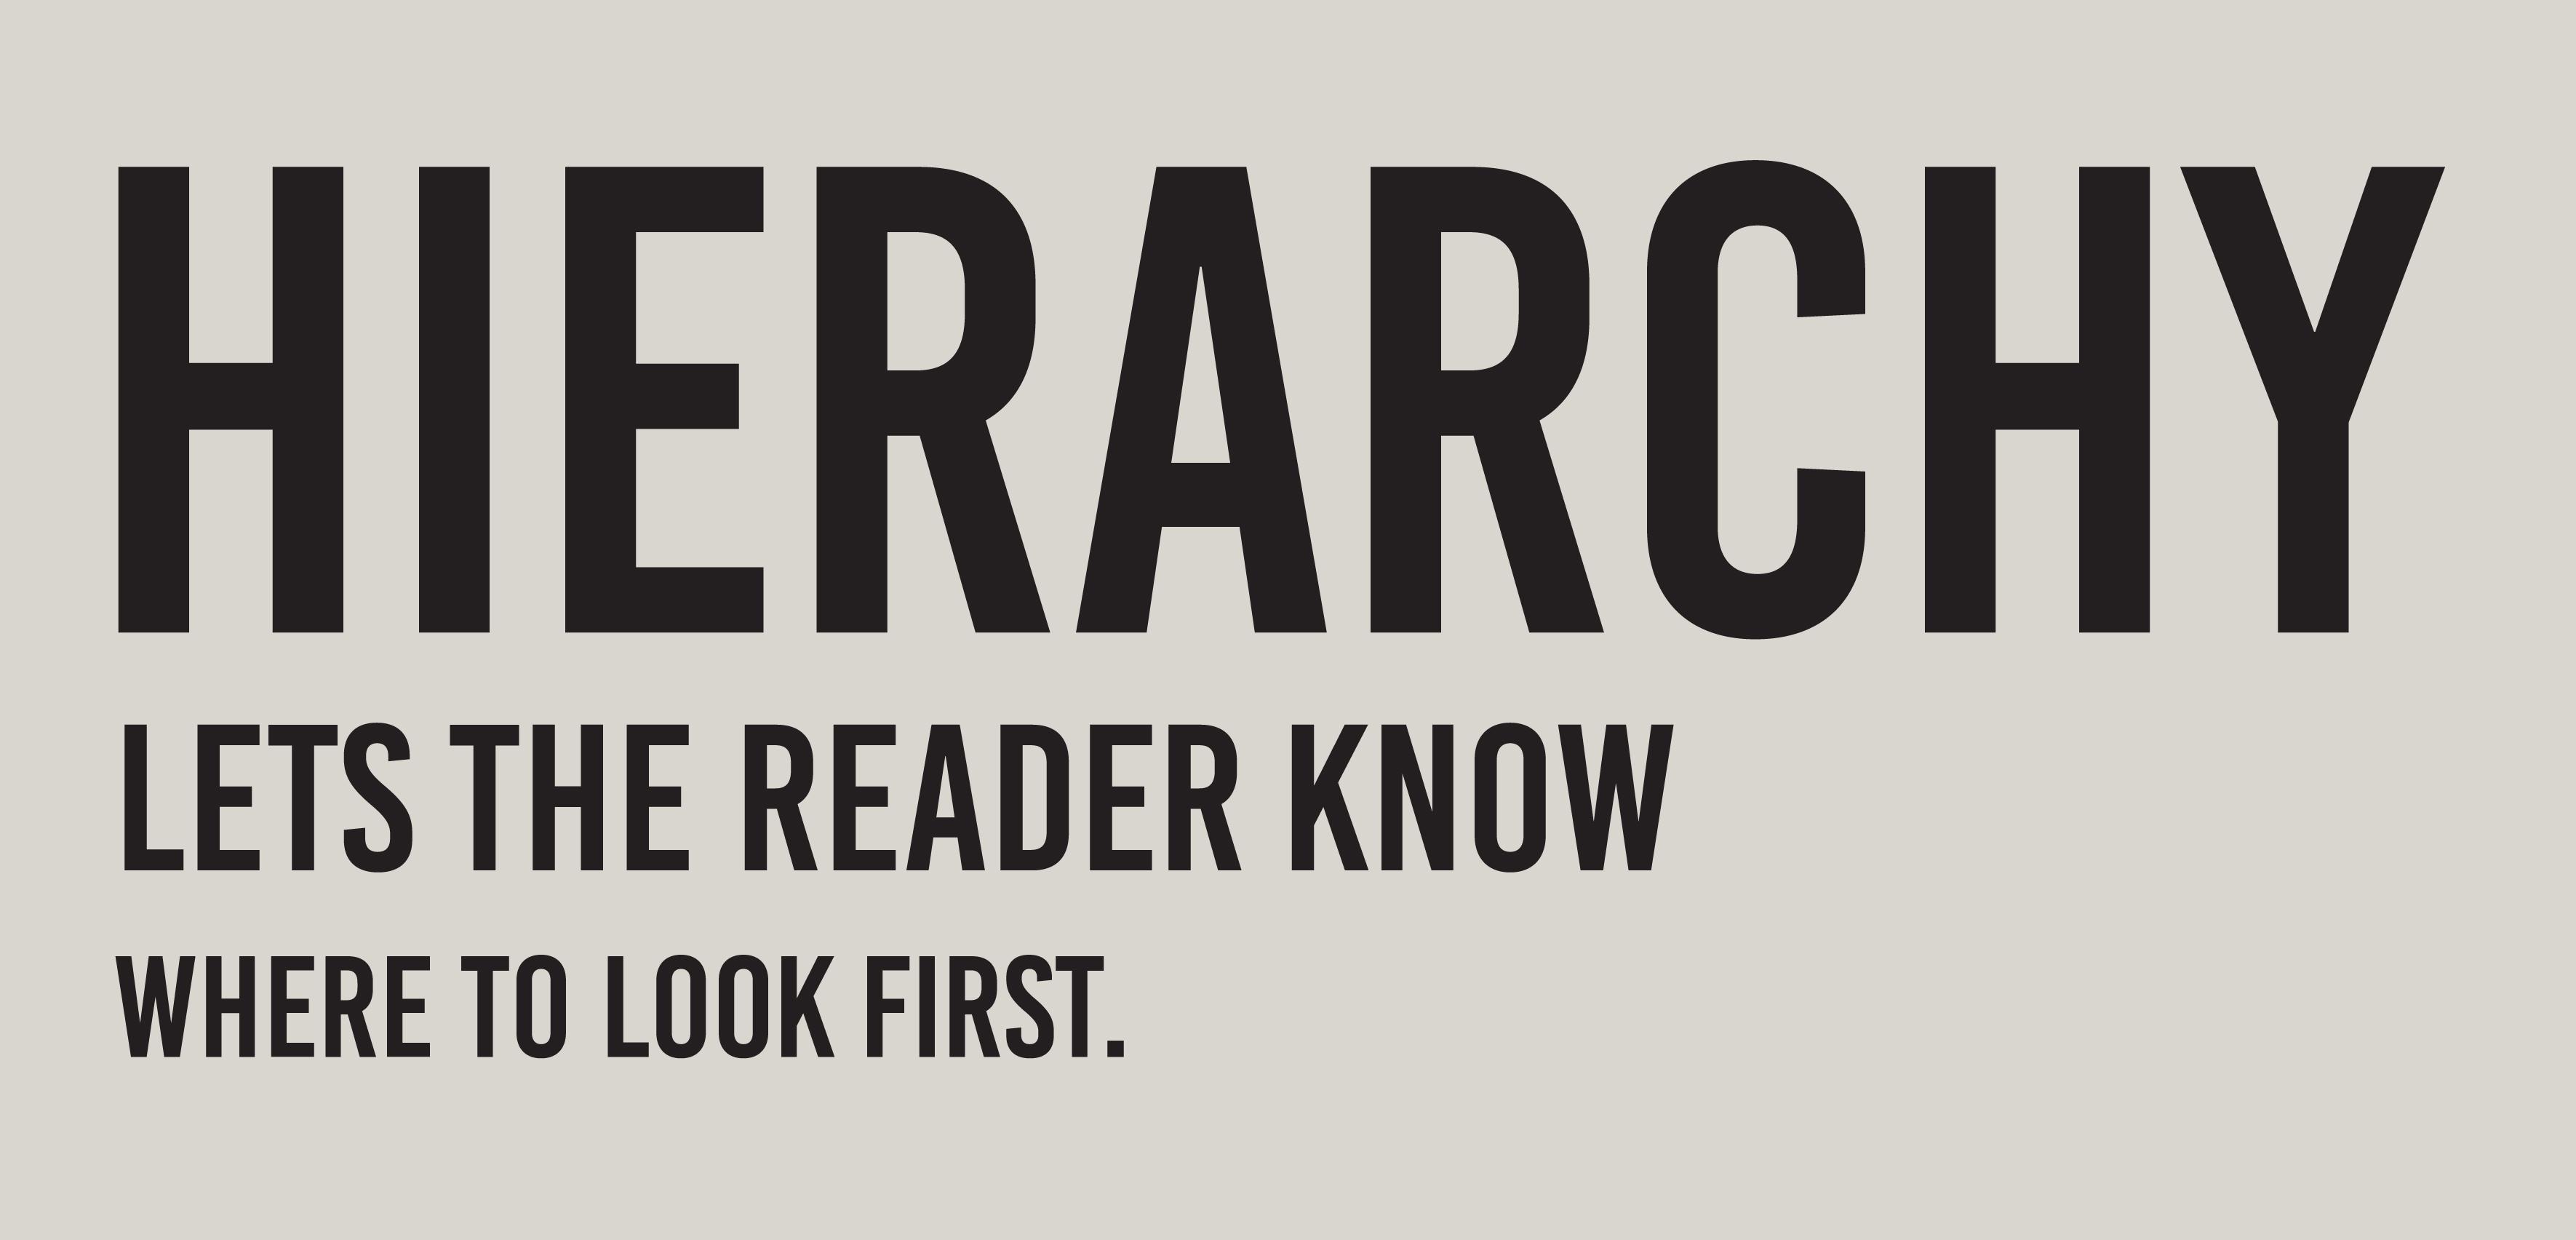 hierarchy in typography yearbooksmakemecrazy com